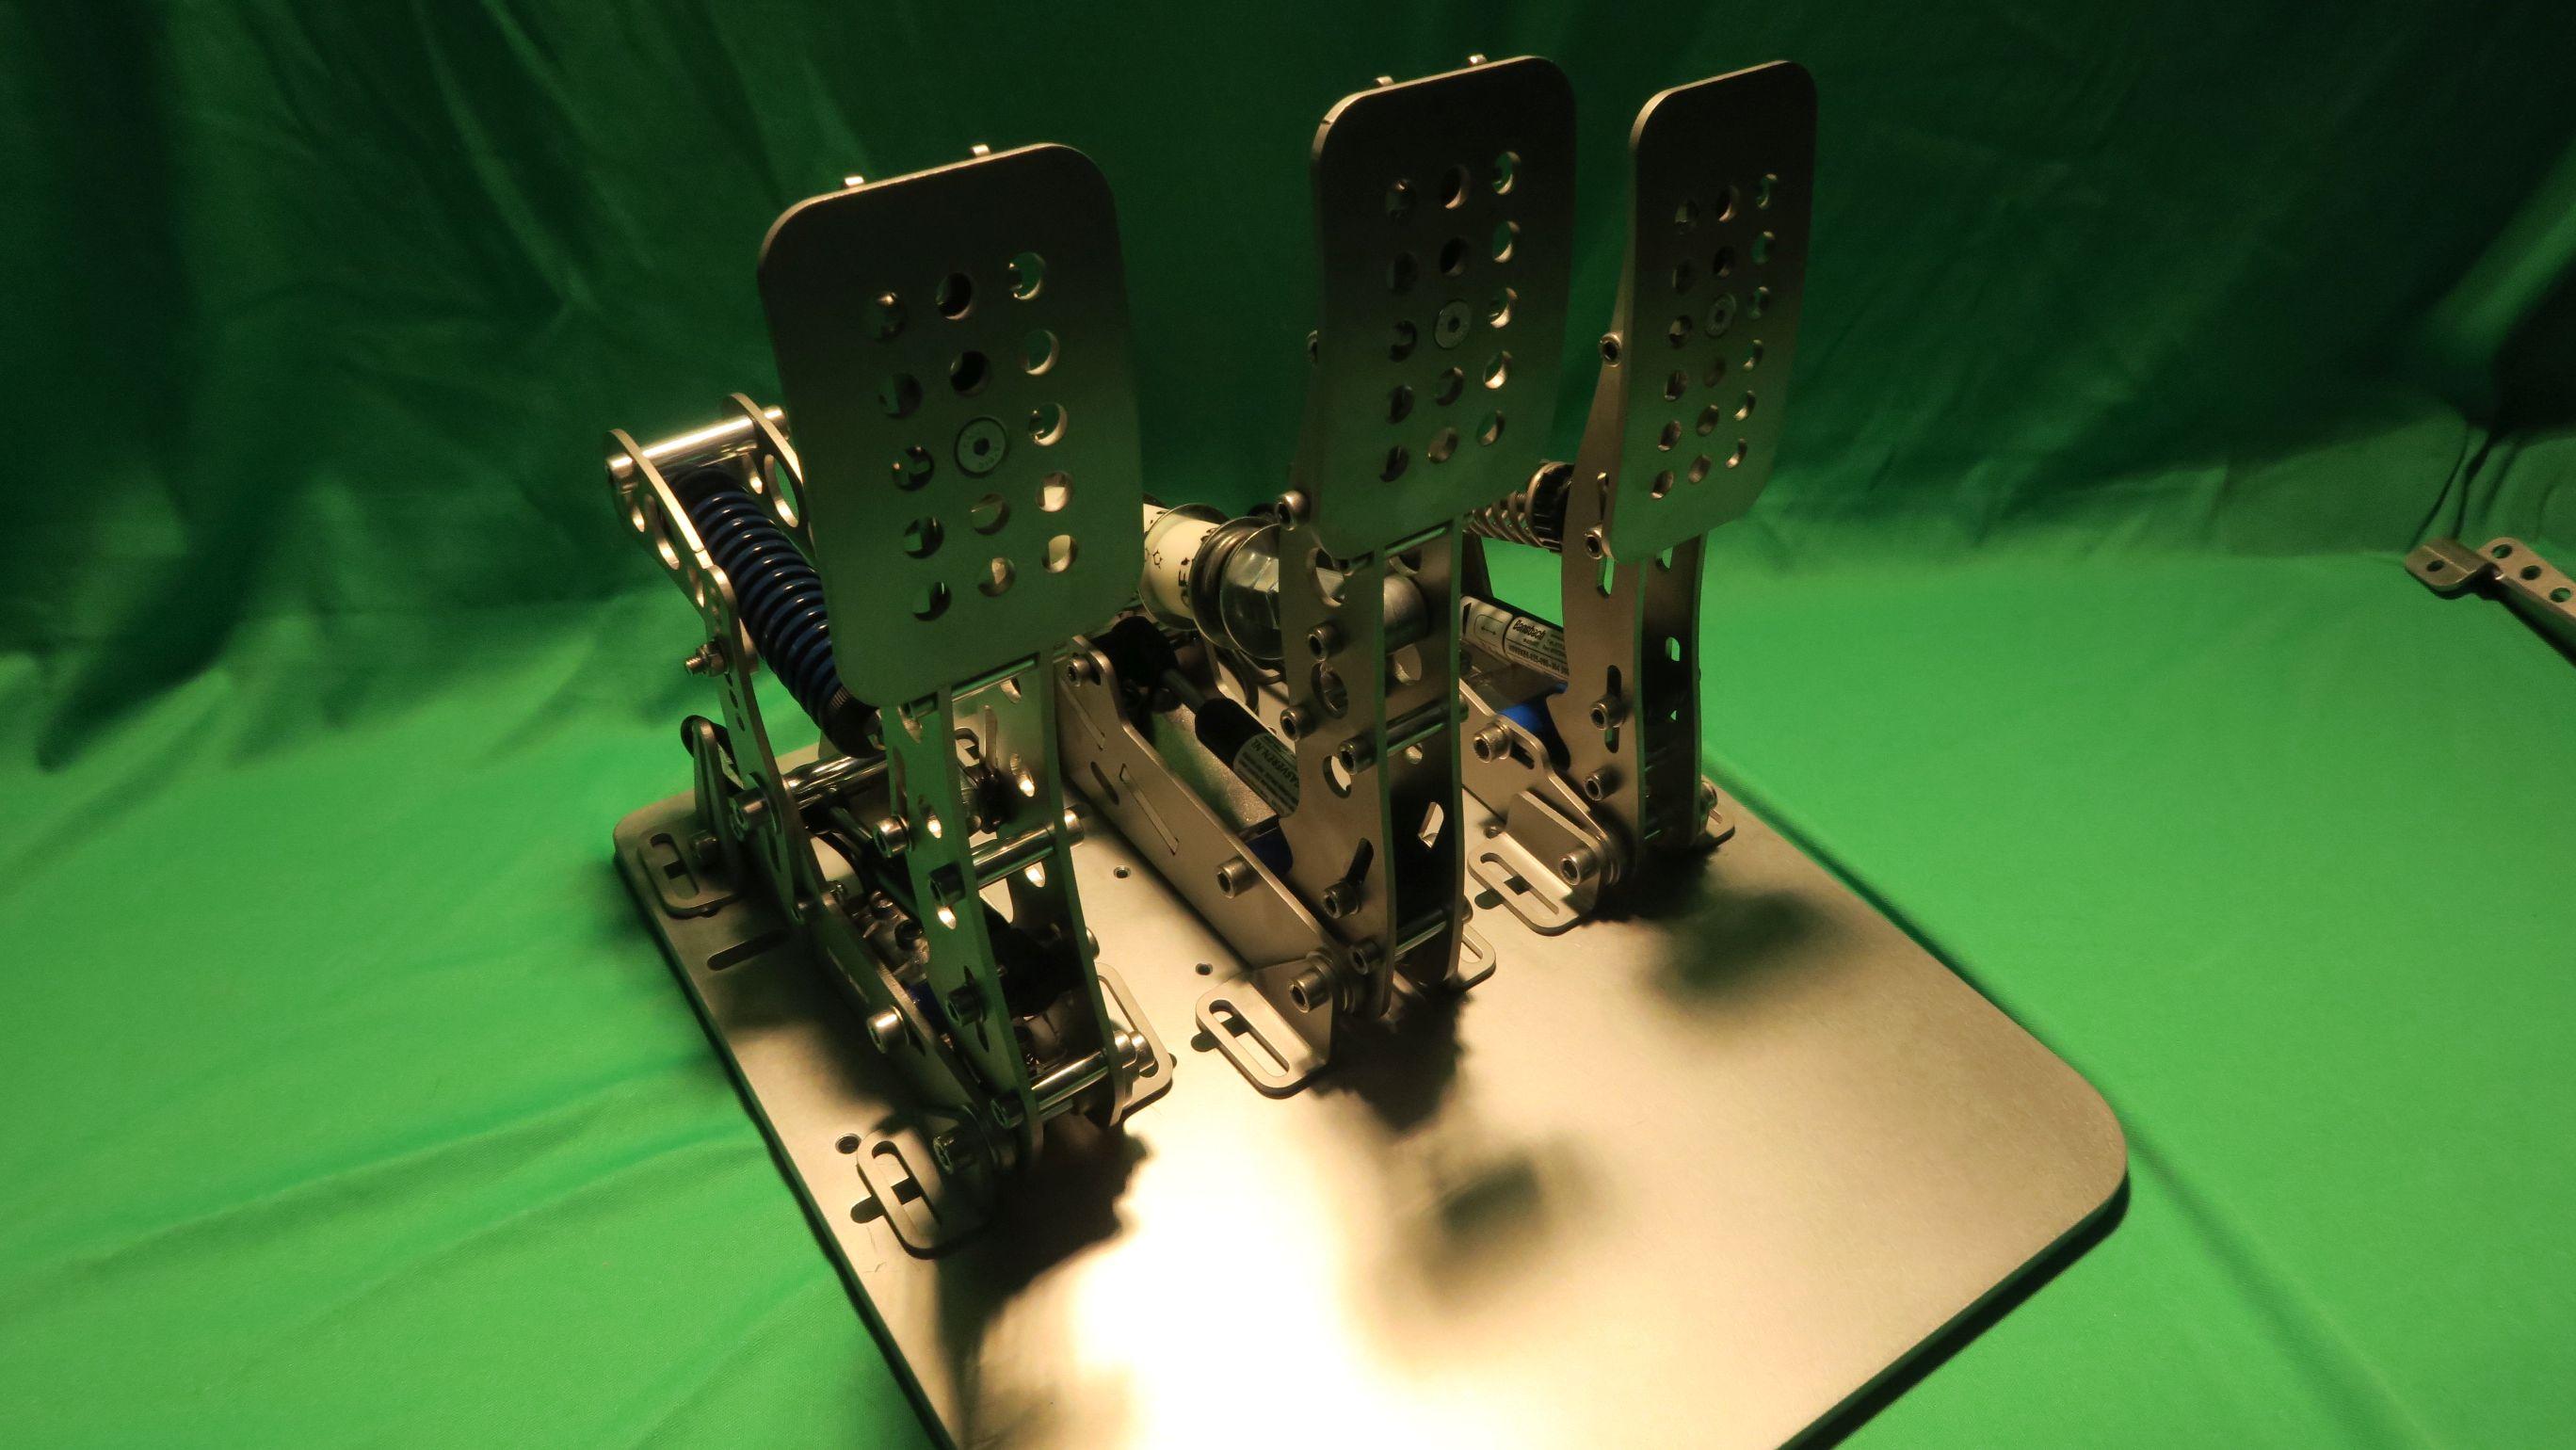 Hardware im Test: Heusinkveld Sim Pedals Ultimate - Profi